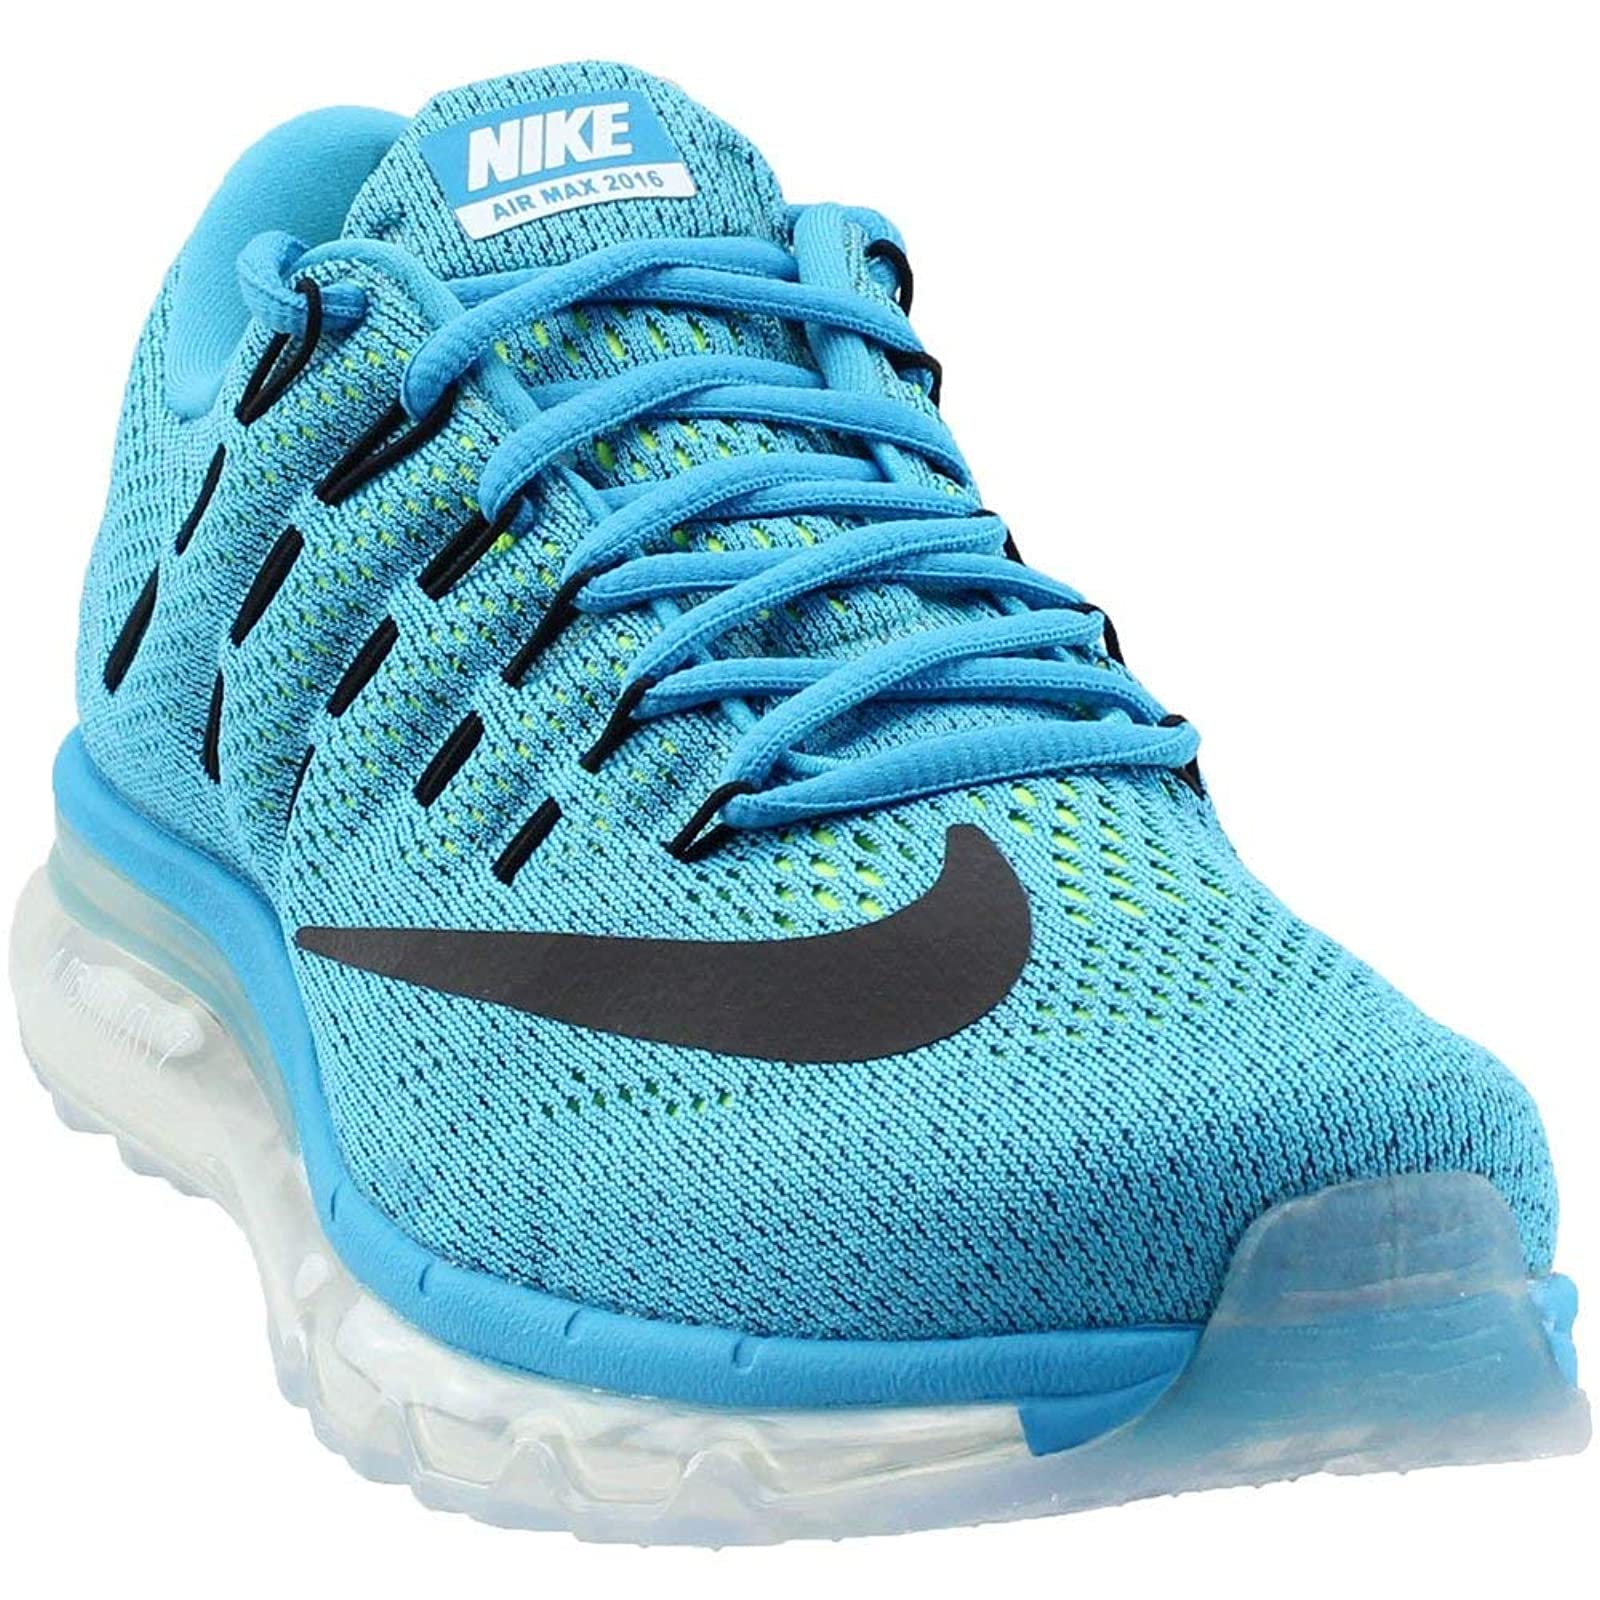 Nike Men's Air Max 2016 Running Shoe 8 M US - 7